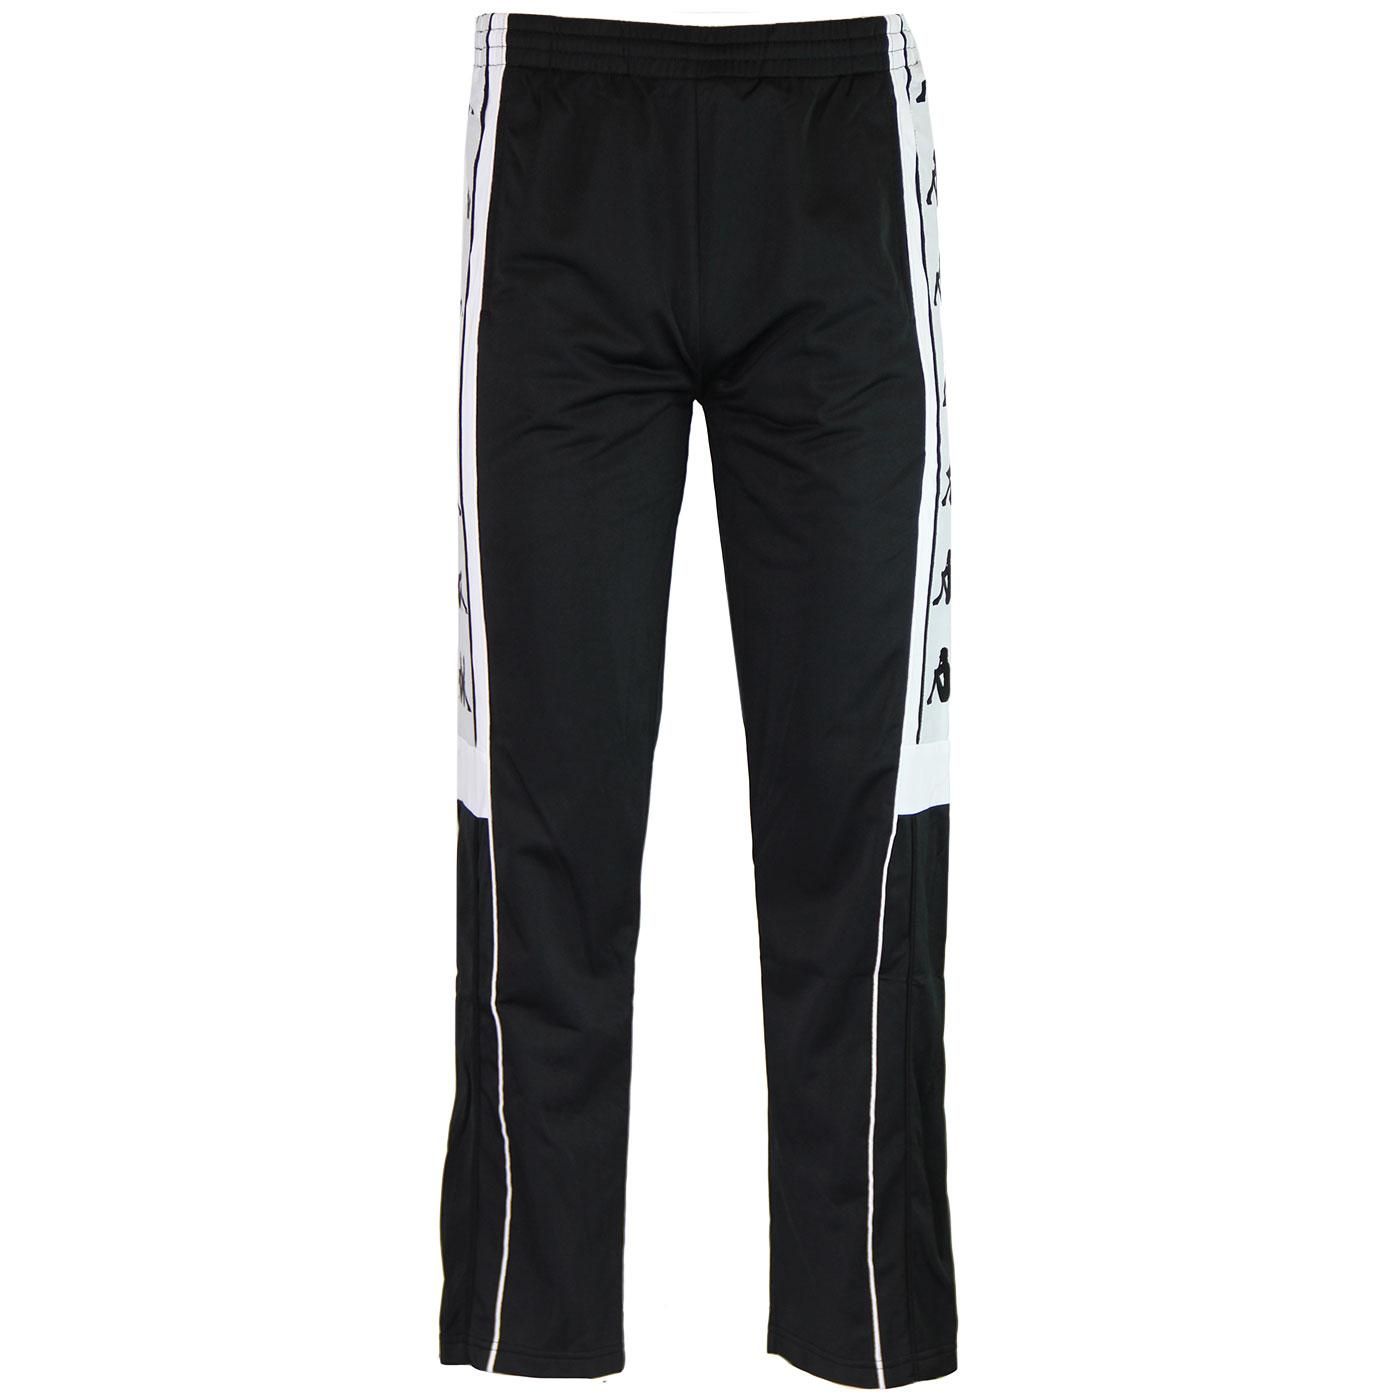 65fdd3c5b2fd KAPPA Banda Arpan Retro Popper Track Pants in Black White